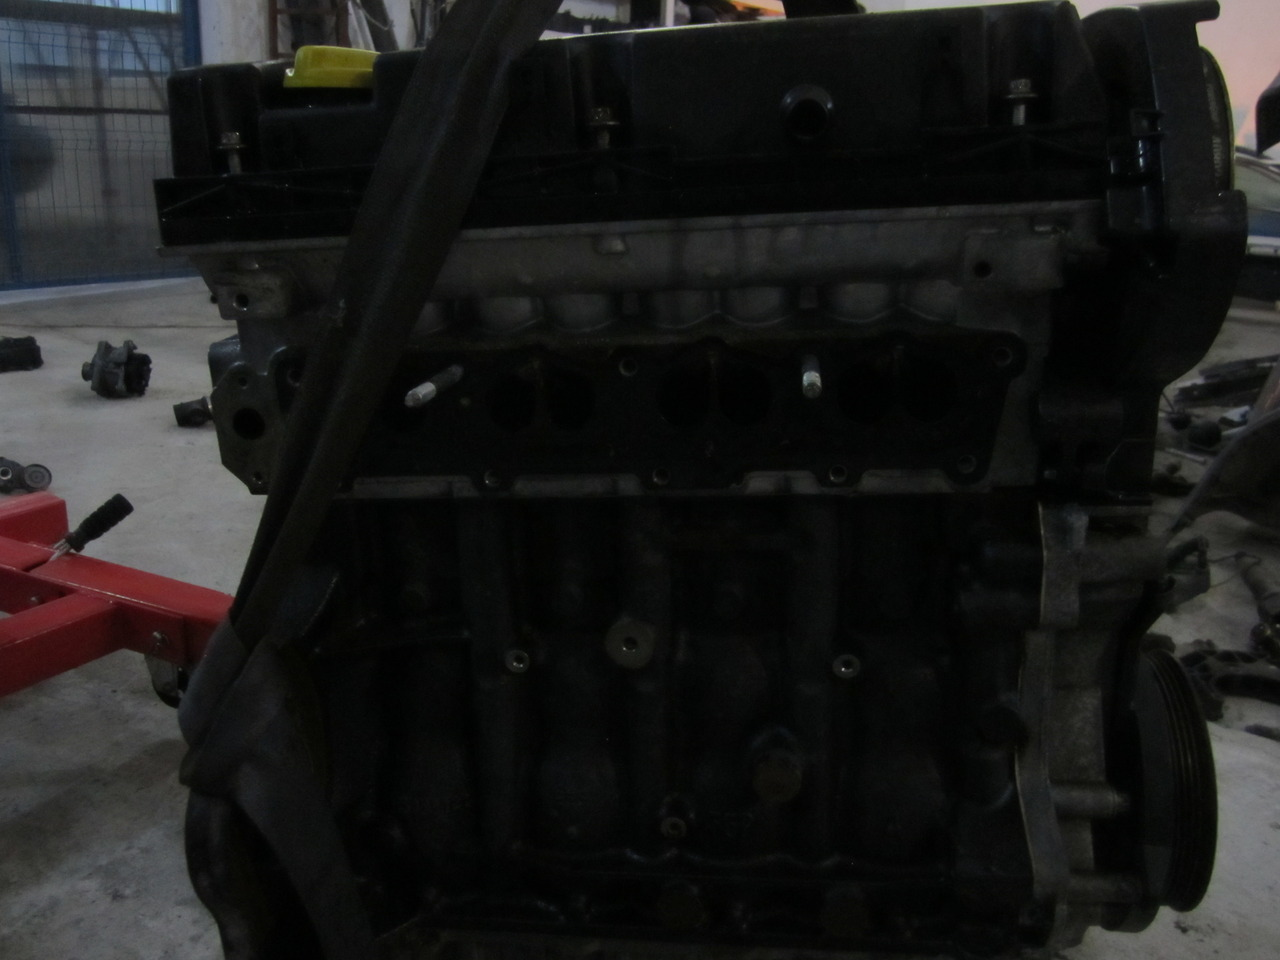 motor opel astra h , astra g 1.6 16 v, cod motor z16xep